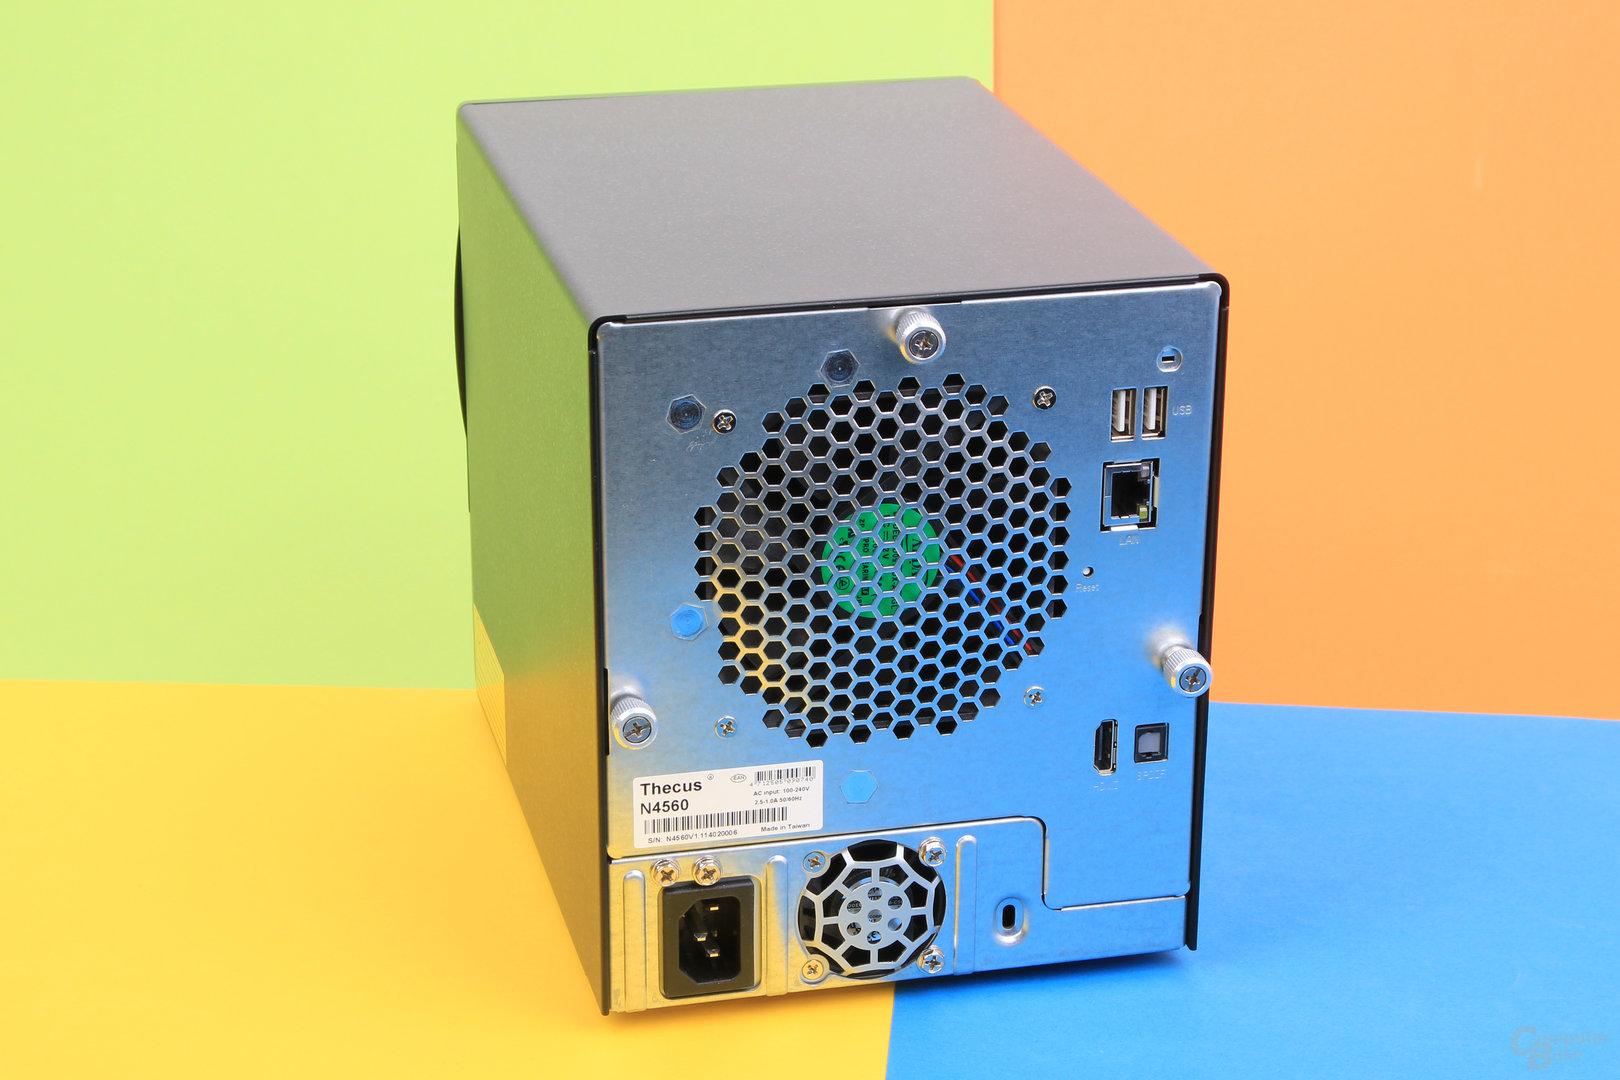 Thecus N4560